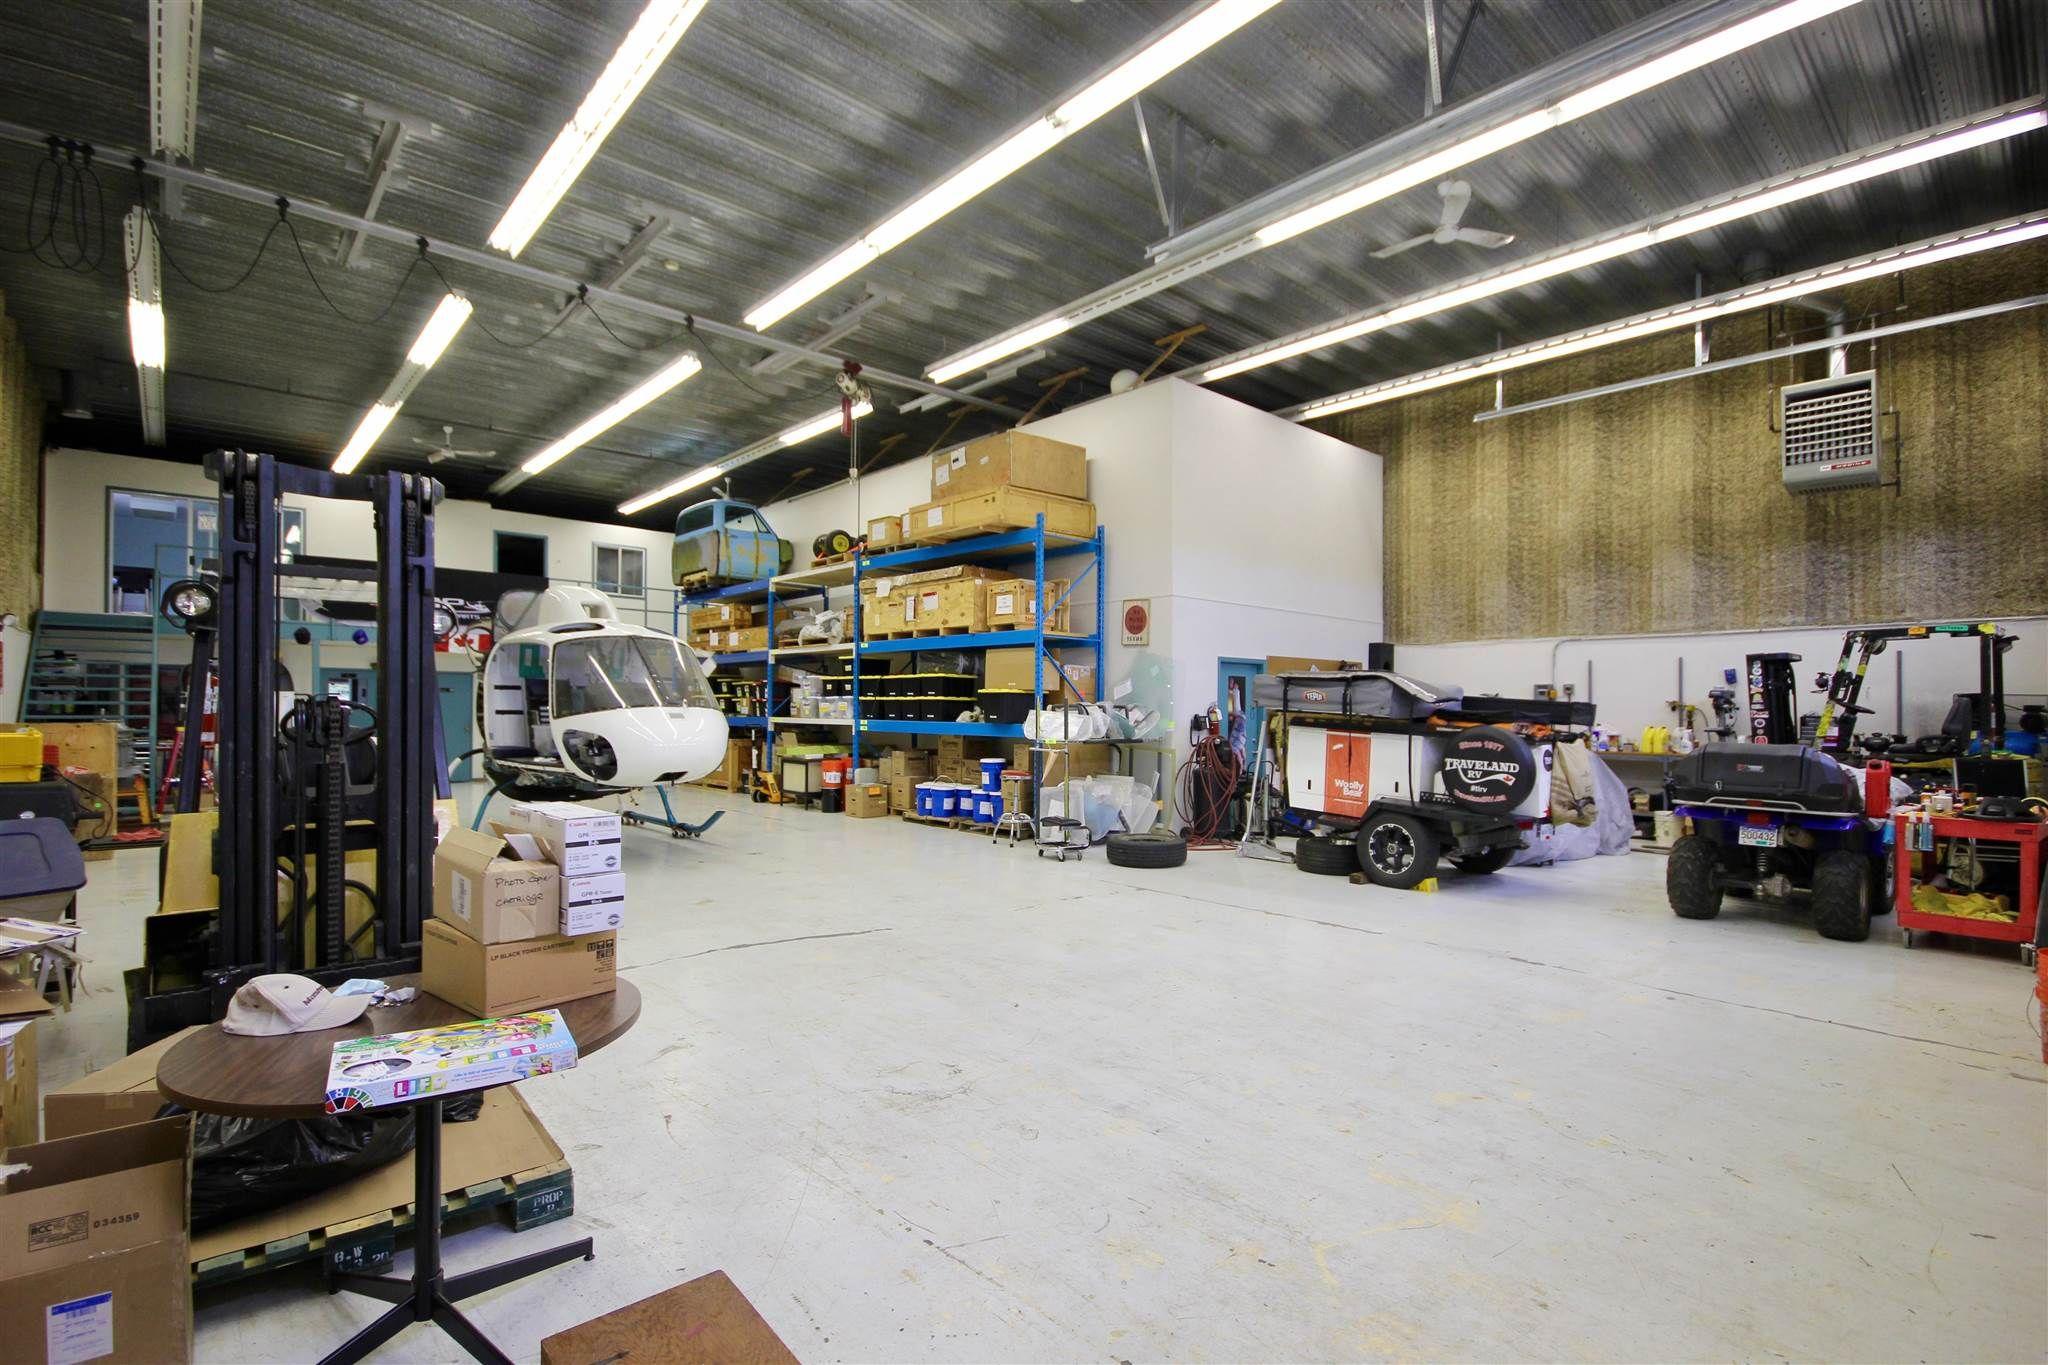 Main Photo: 4193 104 STREET in Delta: East Delta Industrial for sale (Ladner)  : MLS®# C8039240